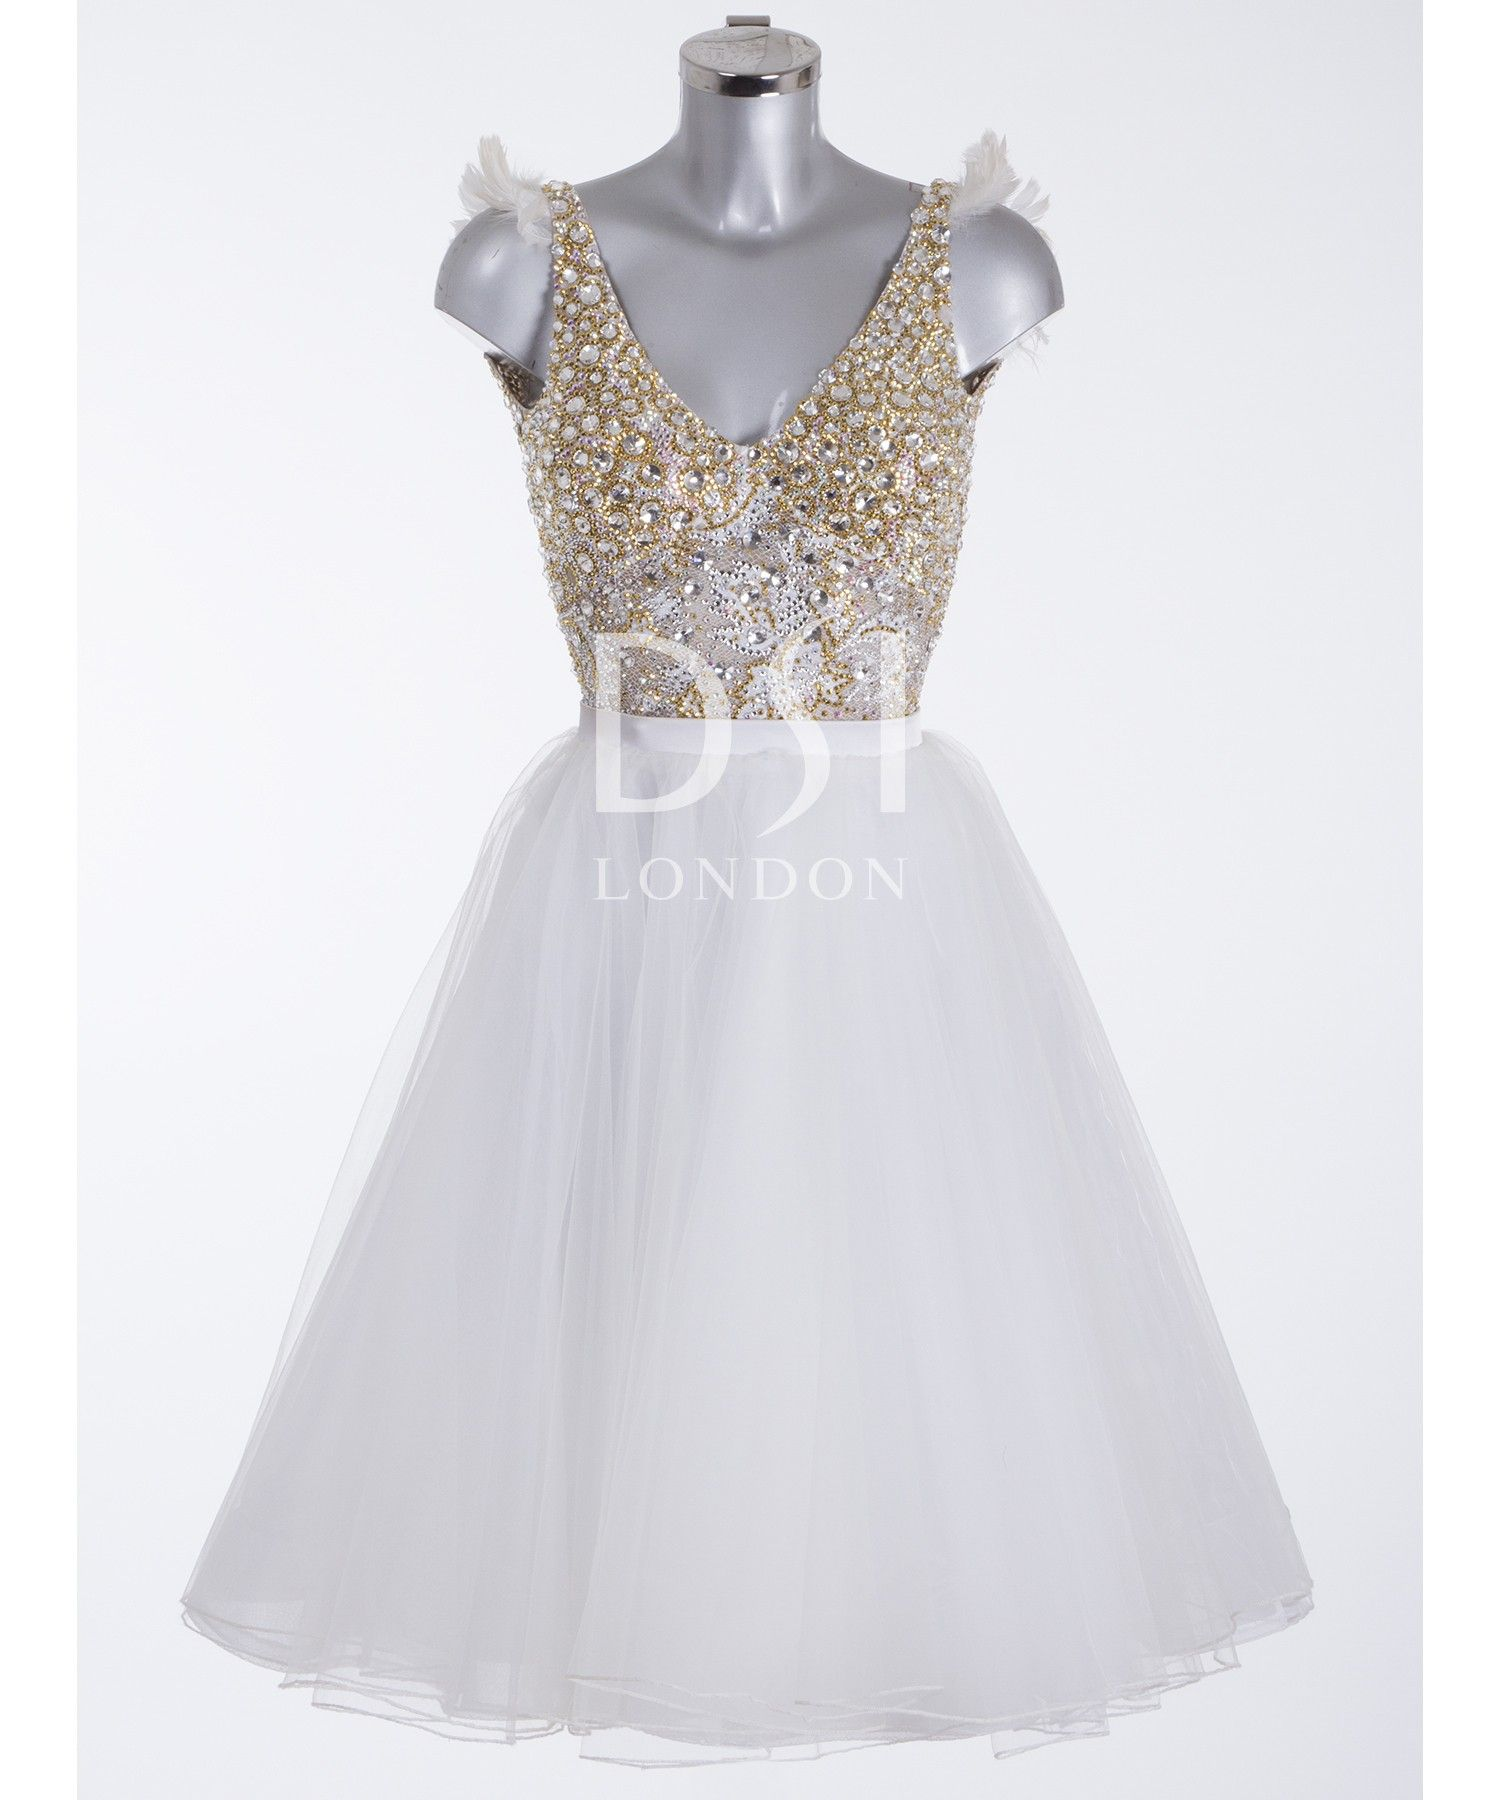 394324 Cream and Gold Ballroom Dress | Ballroom dresses for sale ...